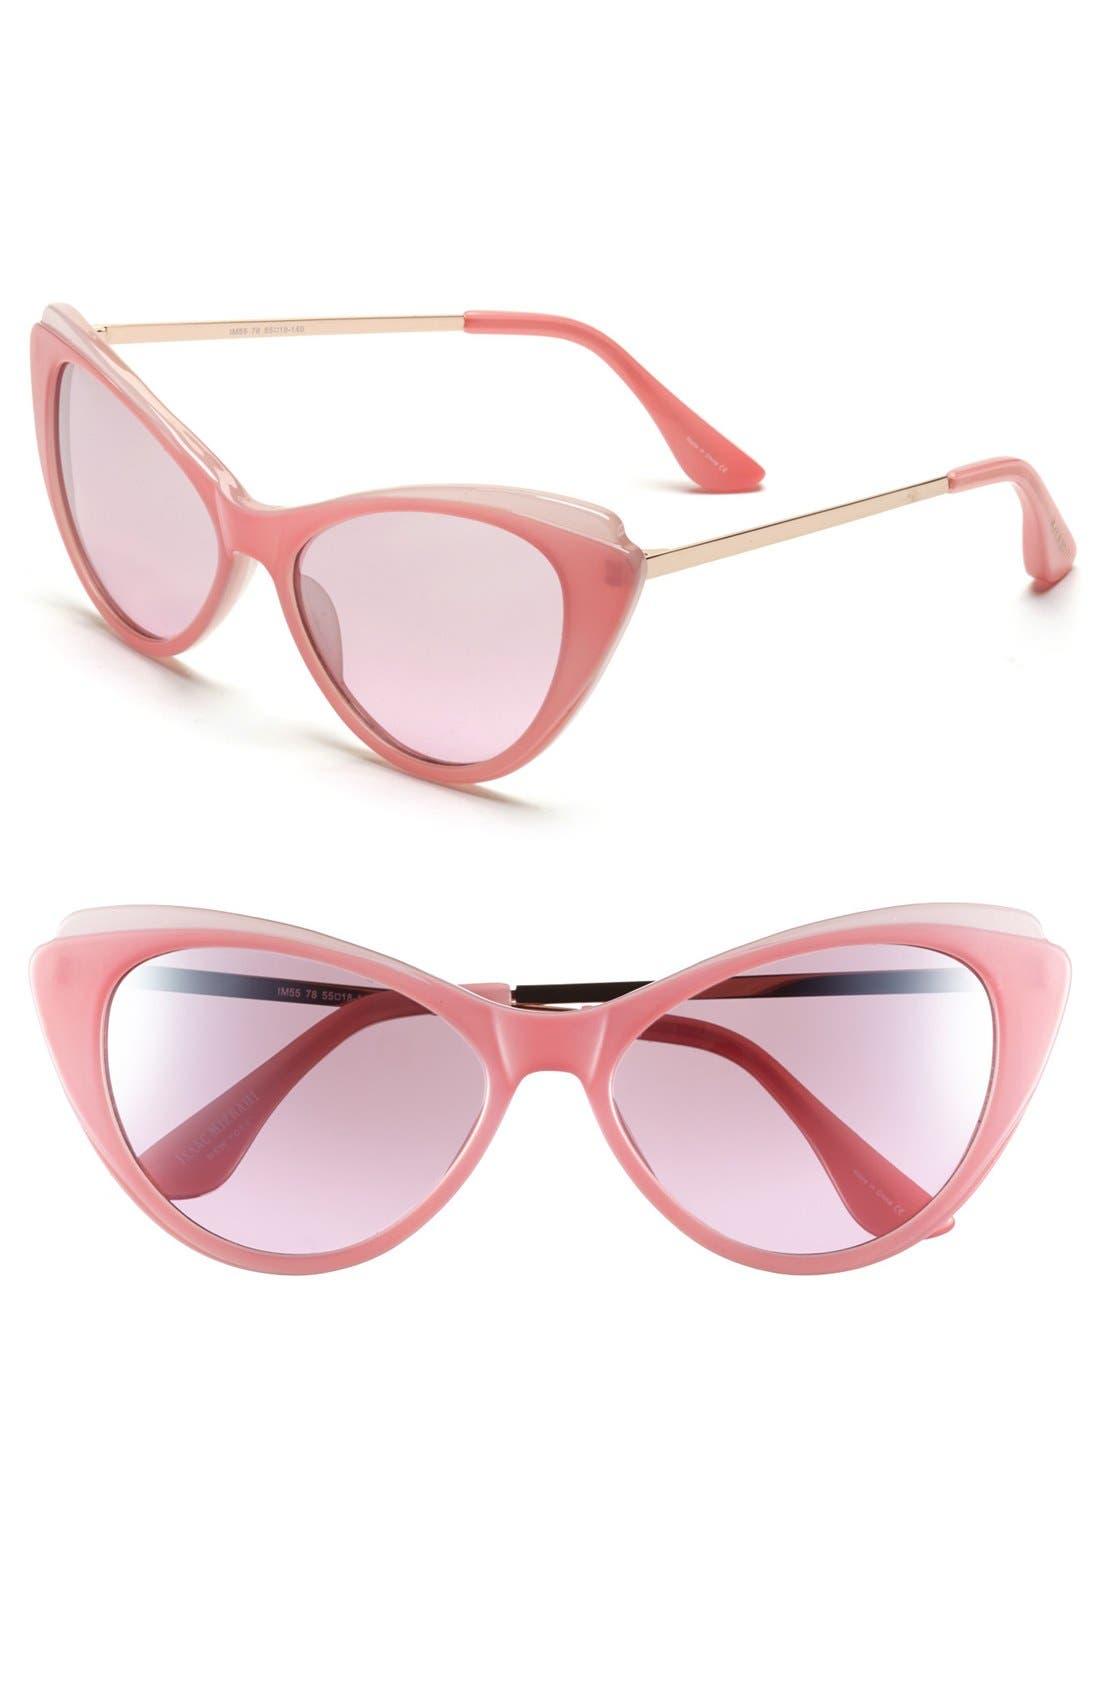 57mm Cat Eye Sunglasses,                             Main thumbnail 1, color,                             Blush